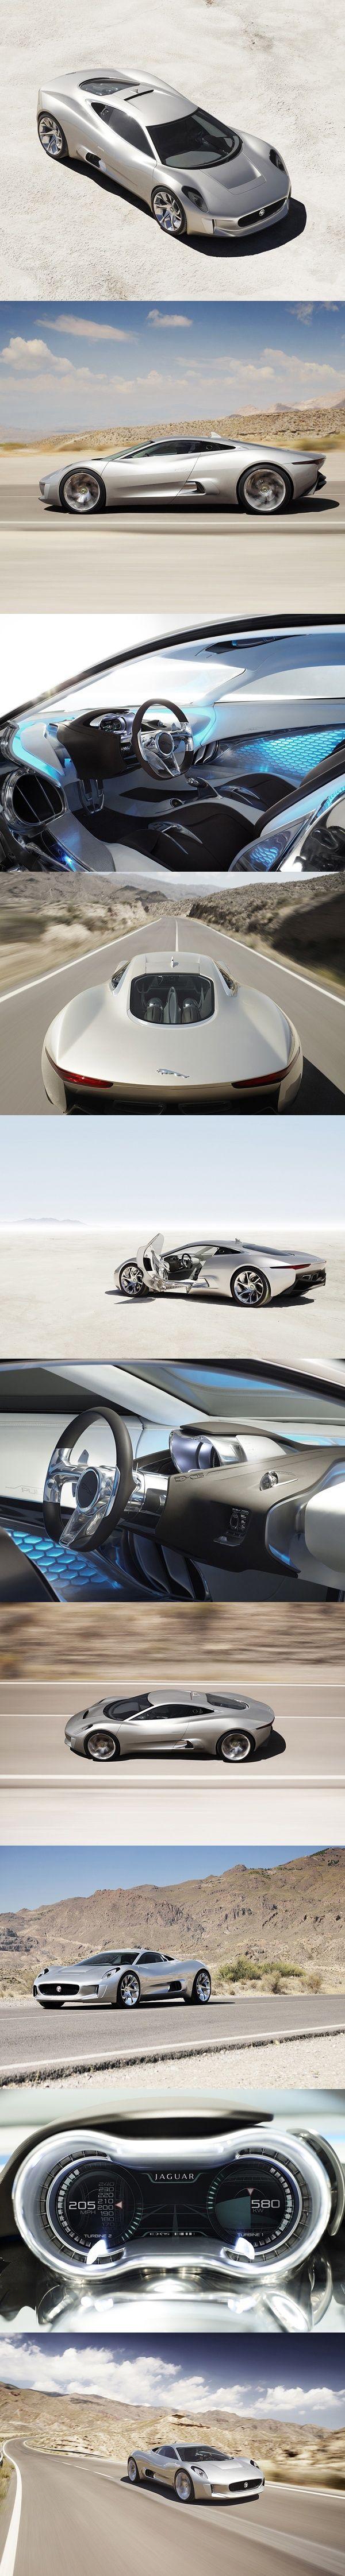 95 best Cars images on Pinterest